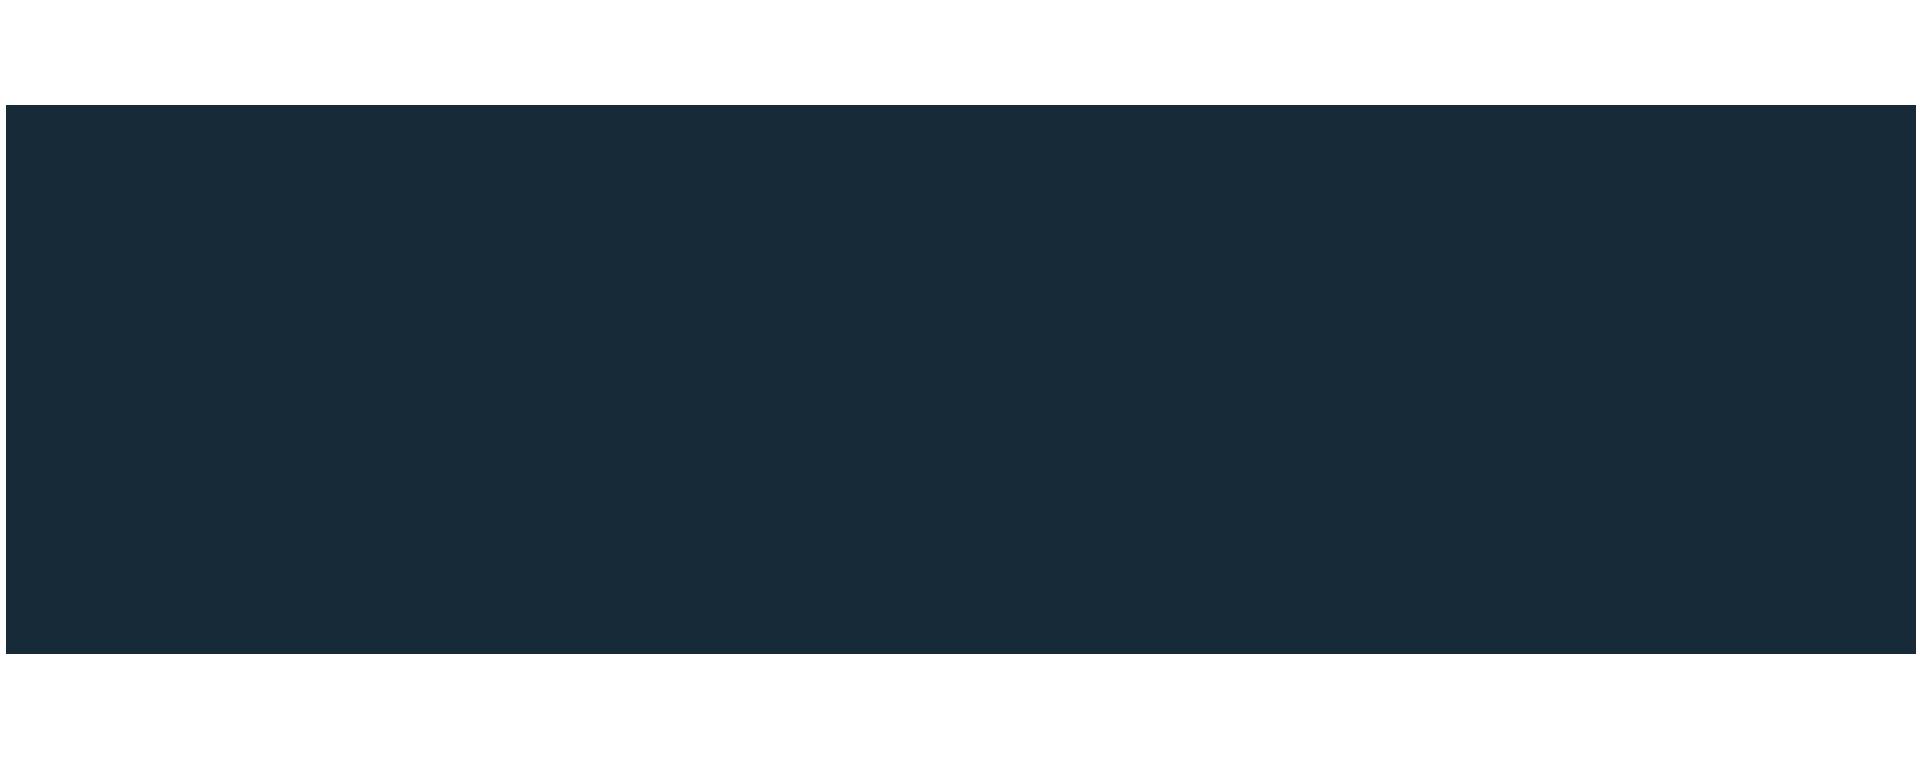 rubrick resize